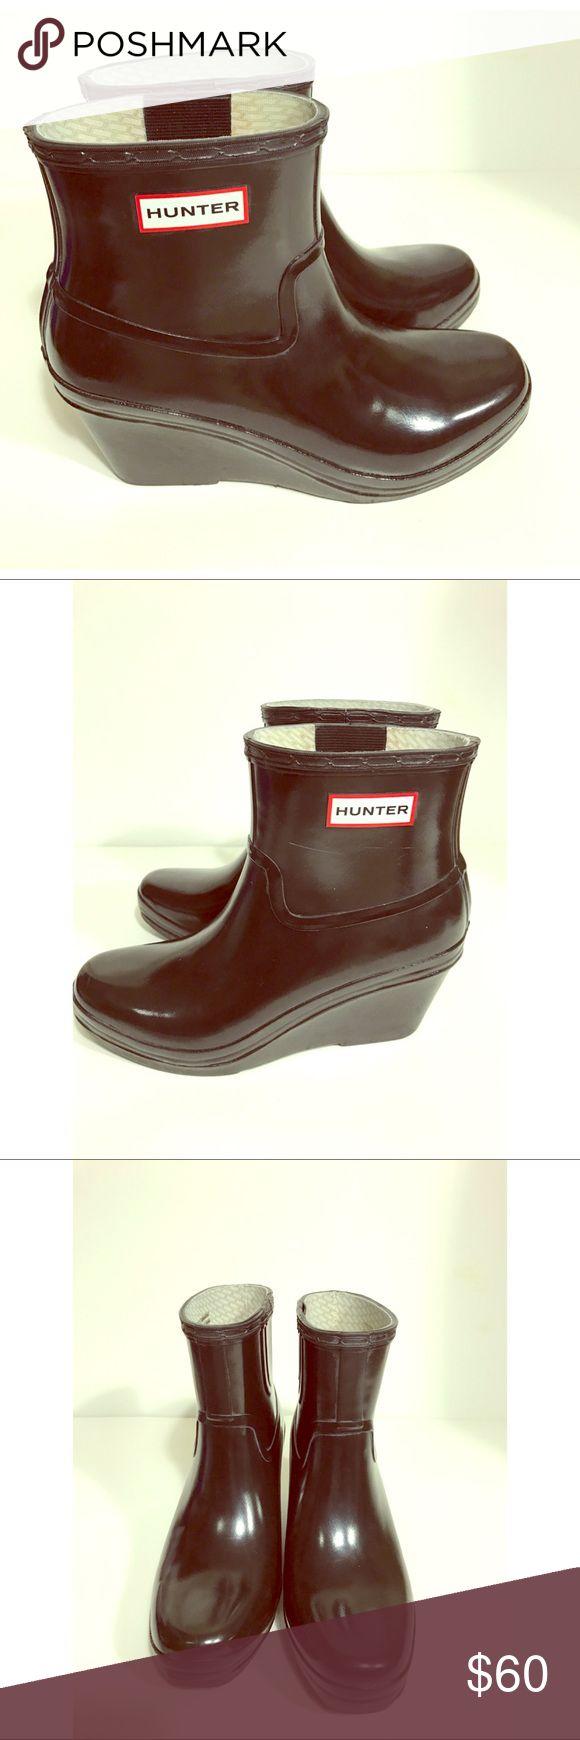 Hunter Original Gloss Wedge Rain Boots Size 7 authentic HUNTER Wedge rain boots size 7 in great condition Hunter Shoes Winter & Rain Boots